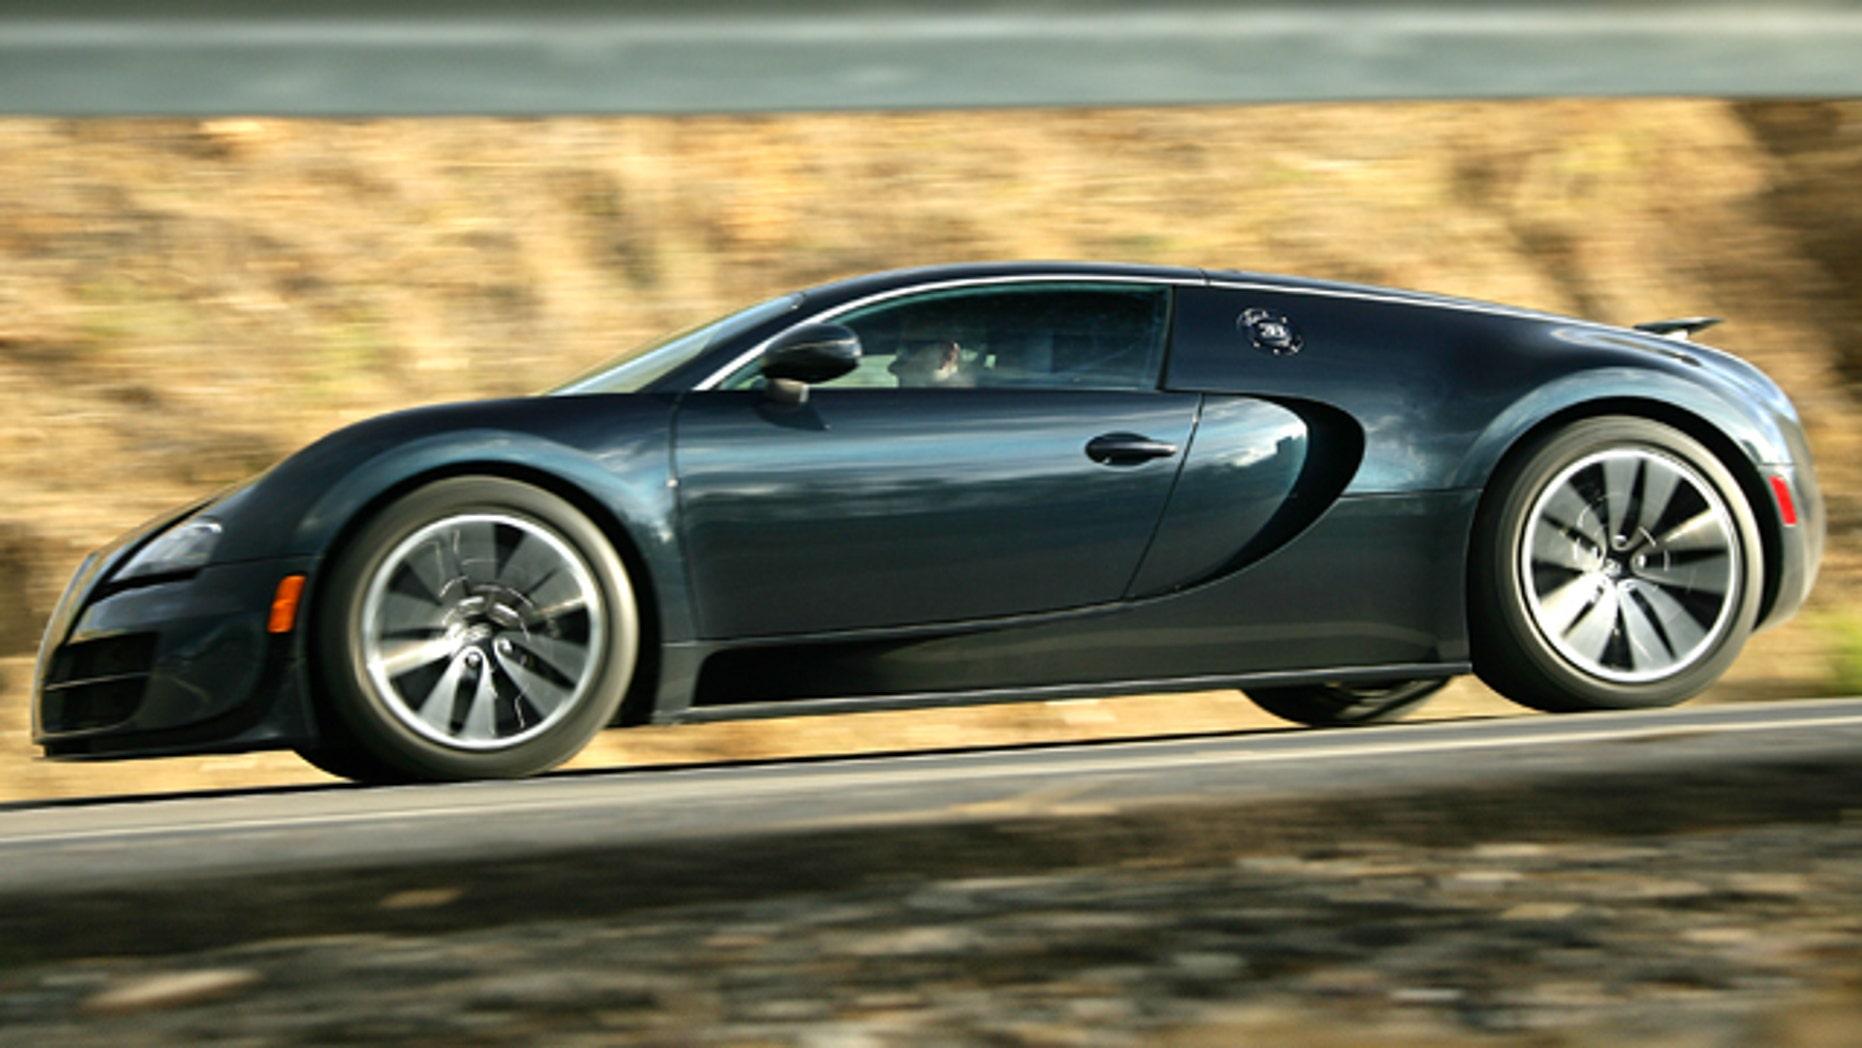 2011 bugatti veyron super sport | fox news